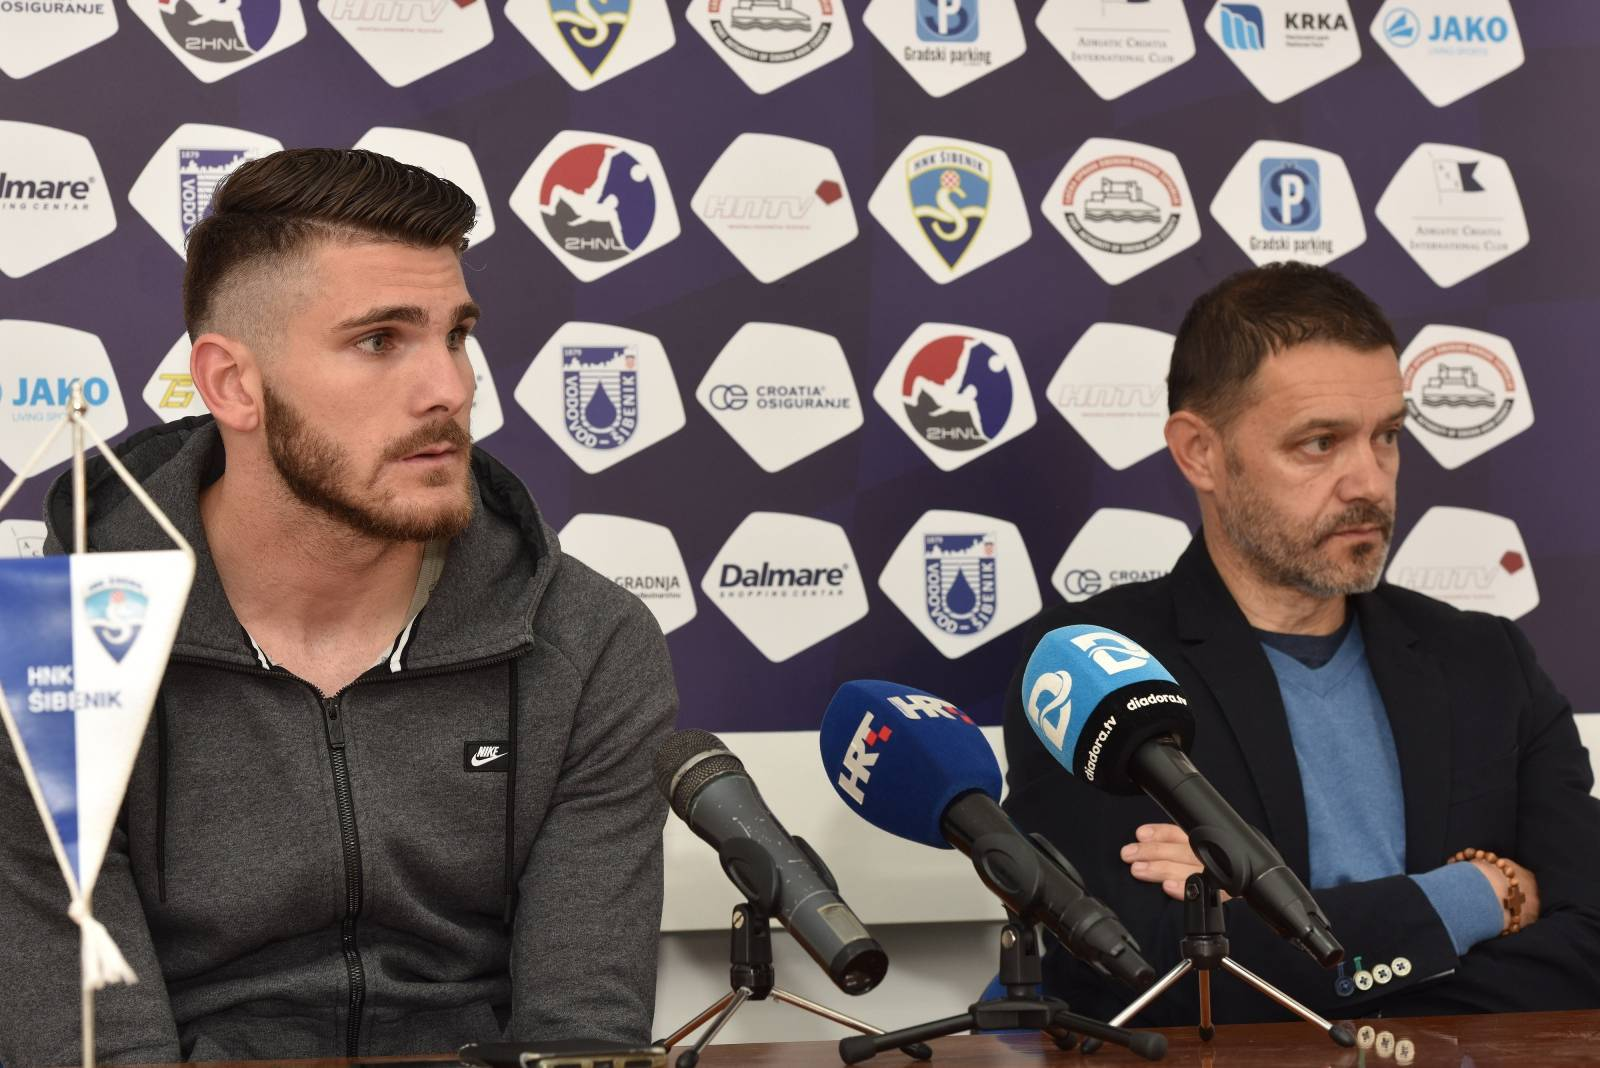 Šibenik: Konferencija NK Šibenika uoèi utakmice s Istrom